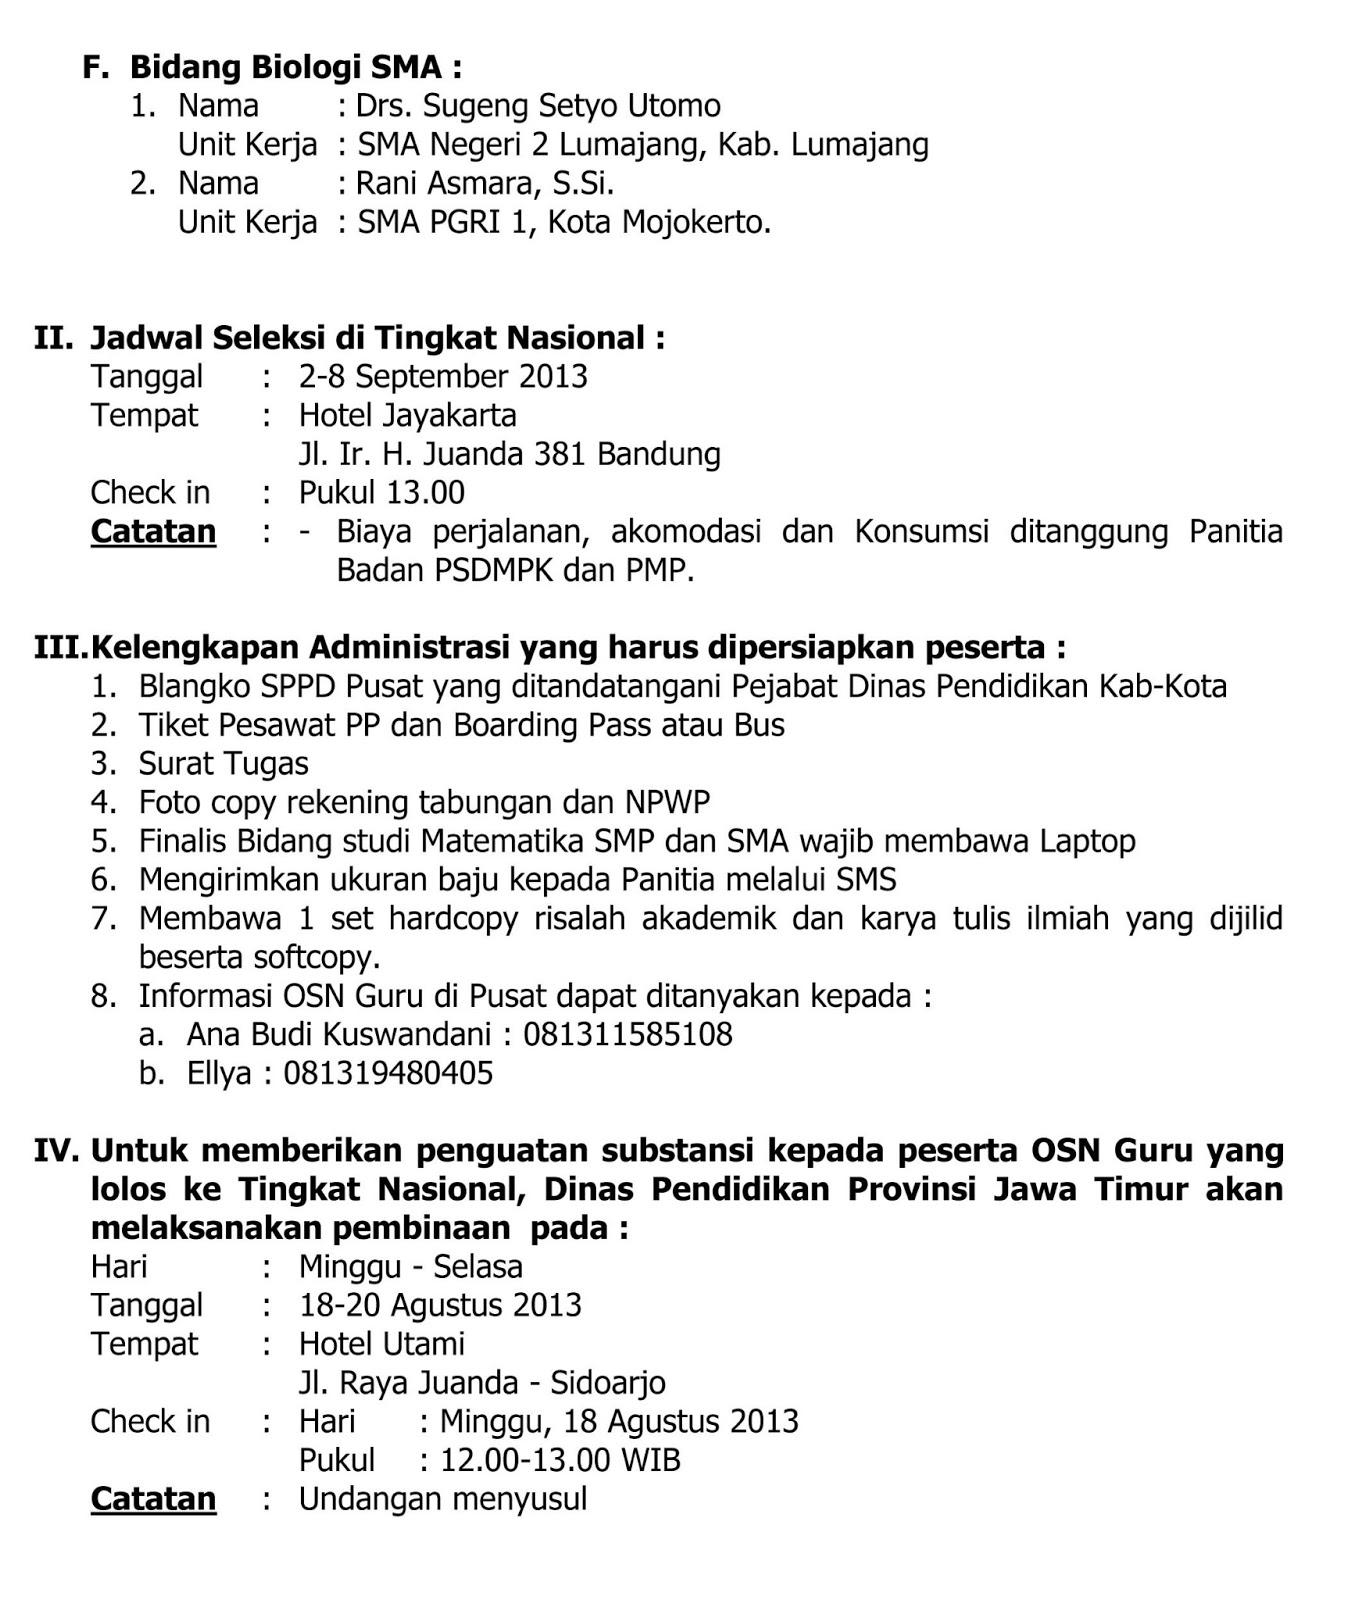 Soal Dan Pembahasan Osn Olimpiade Sains Nasional Sma Kabupaten 2013 Bed Mattress Sale